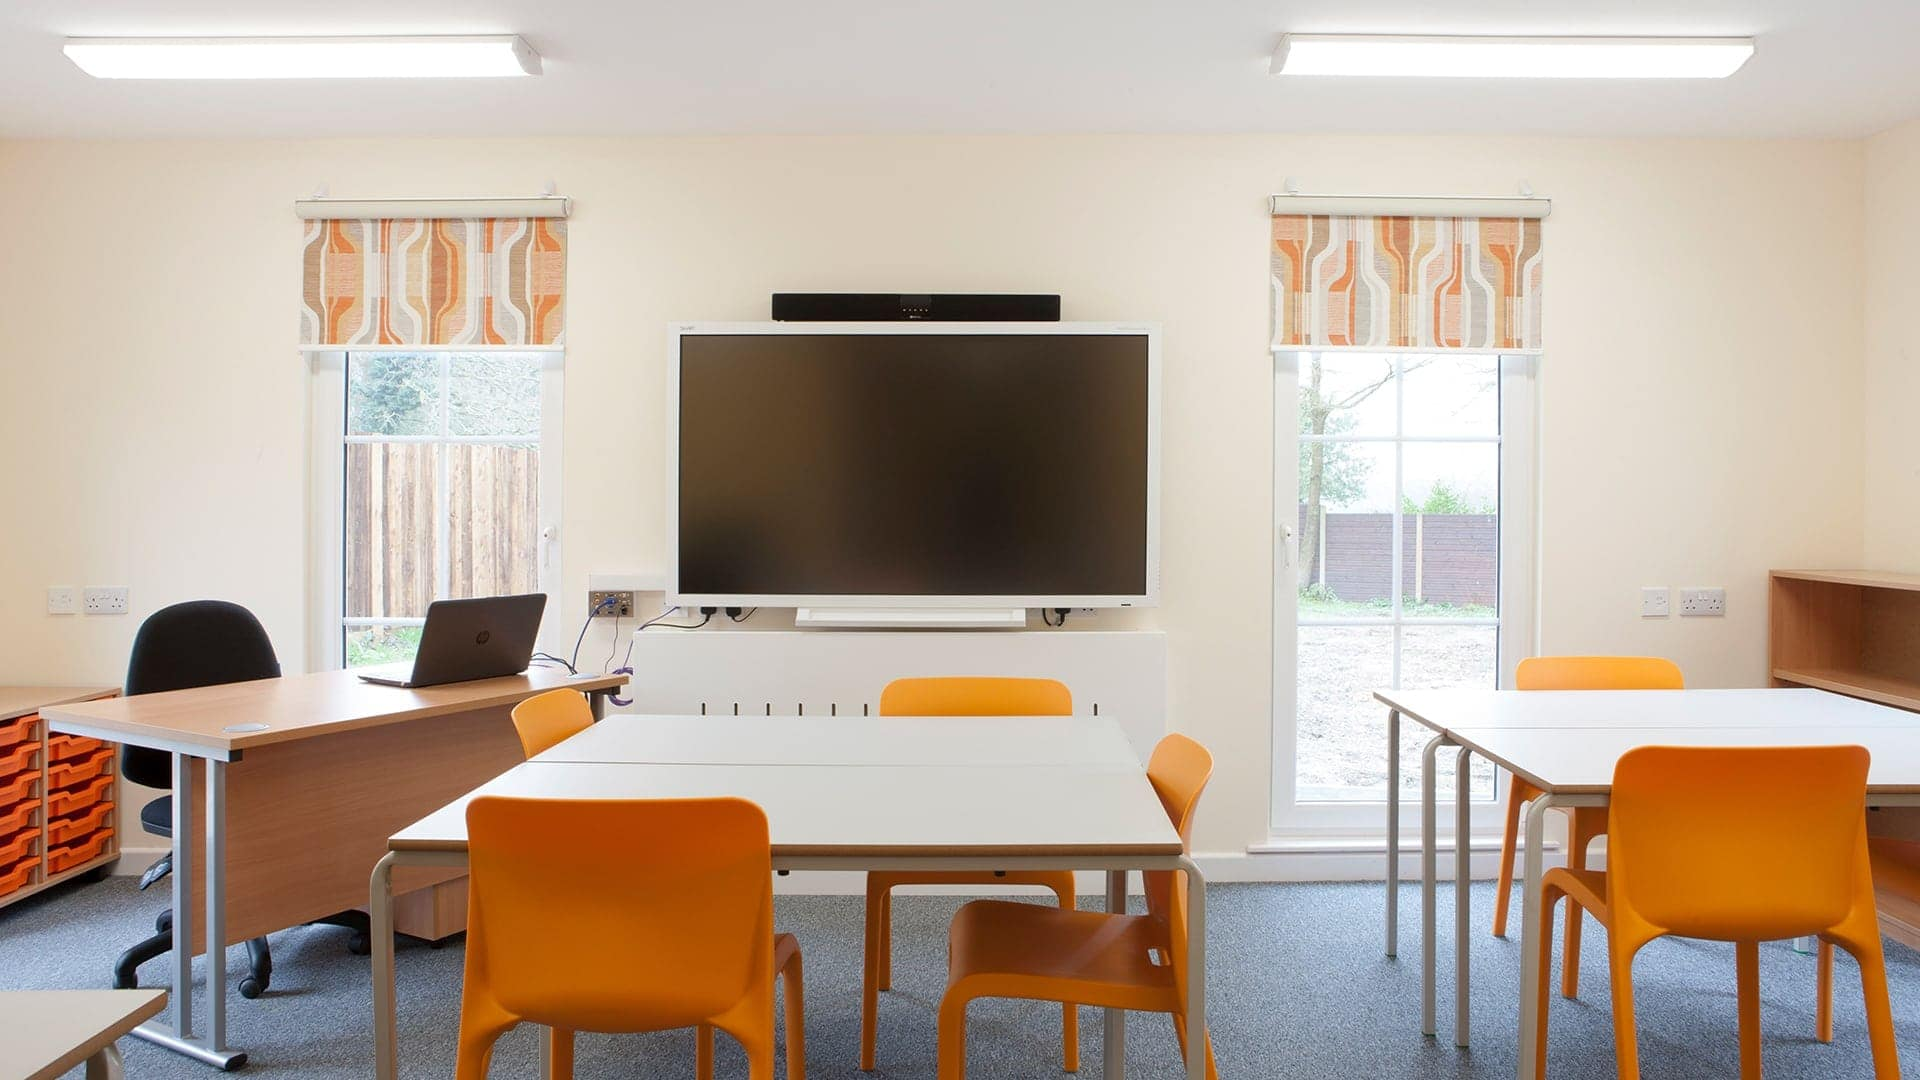 fire retardant school blinds